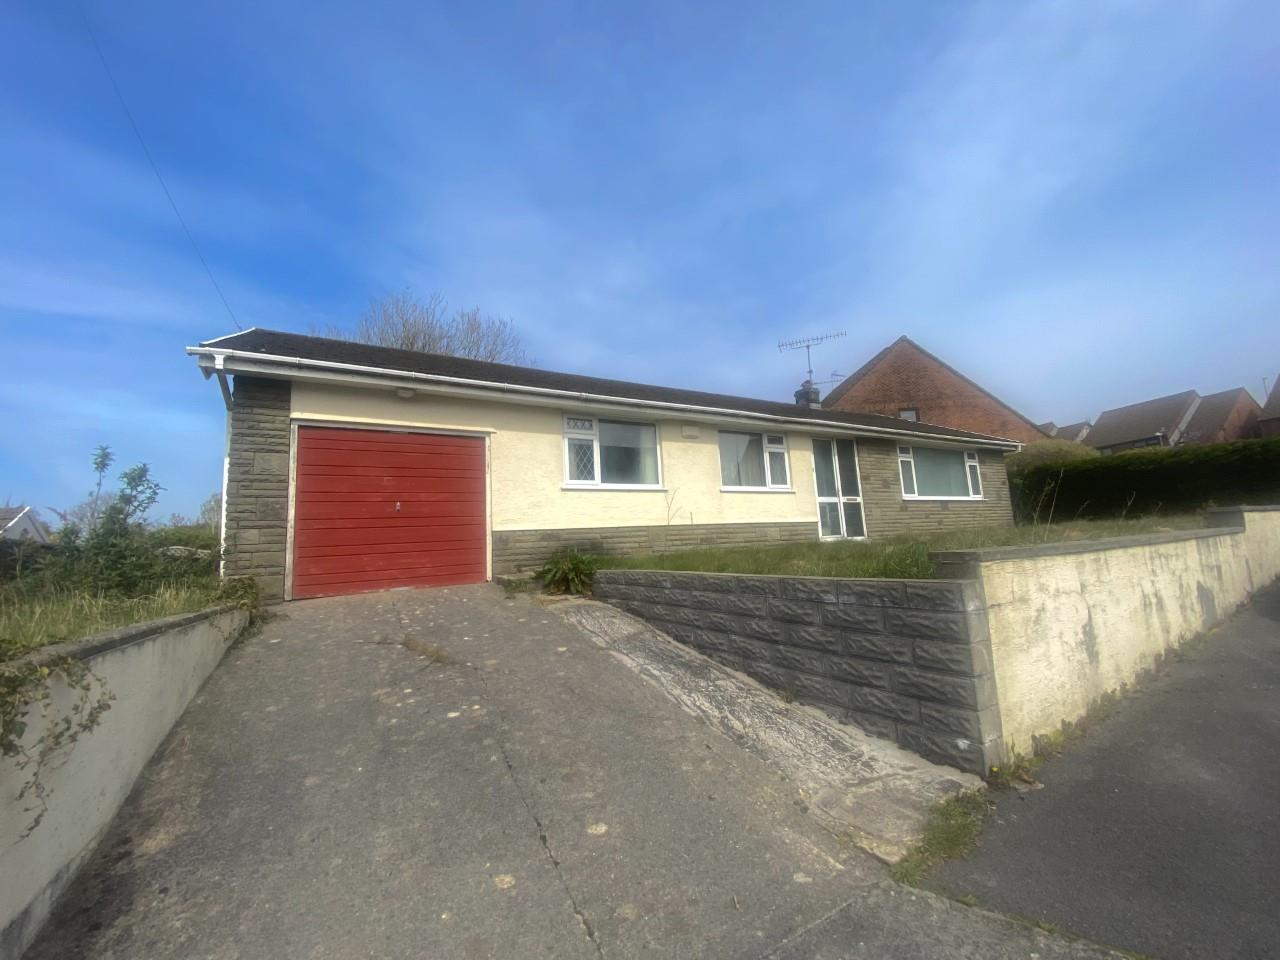 Orchard Drive, Three Crosses, Swansea, SA4 3PQ